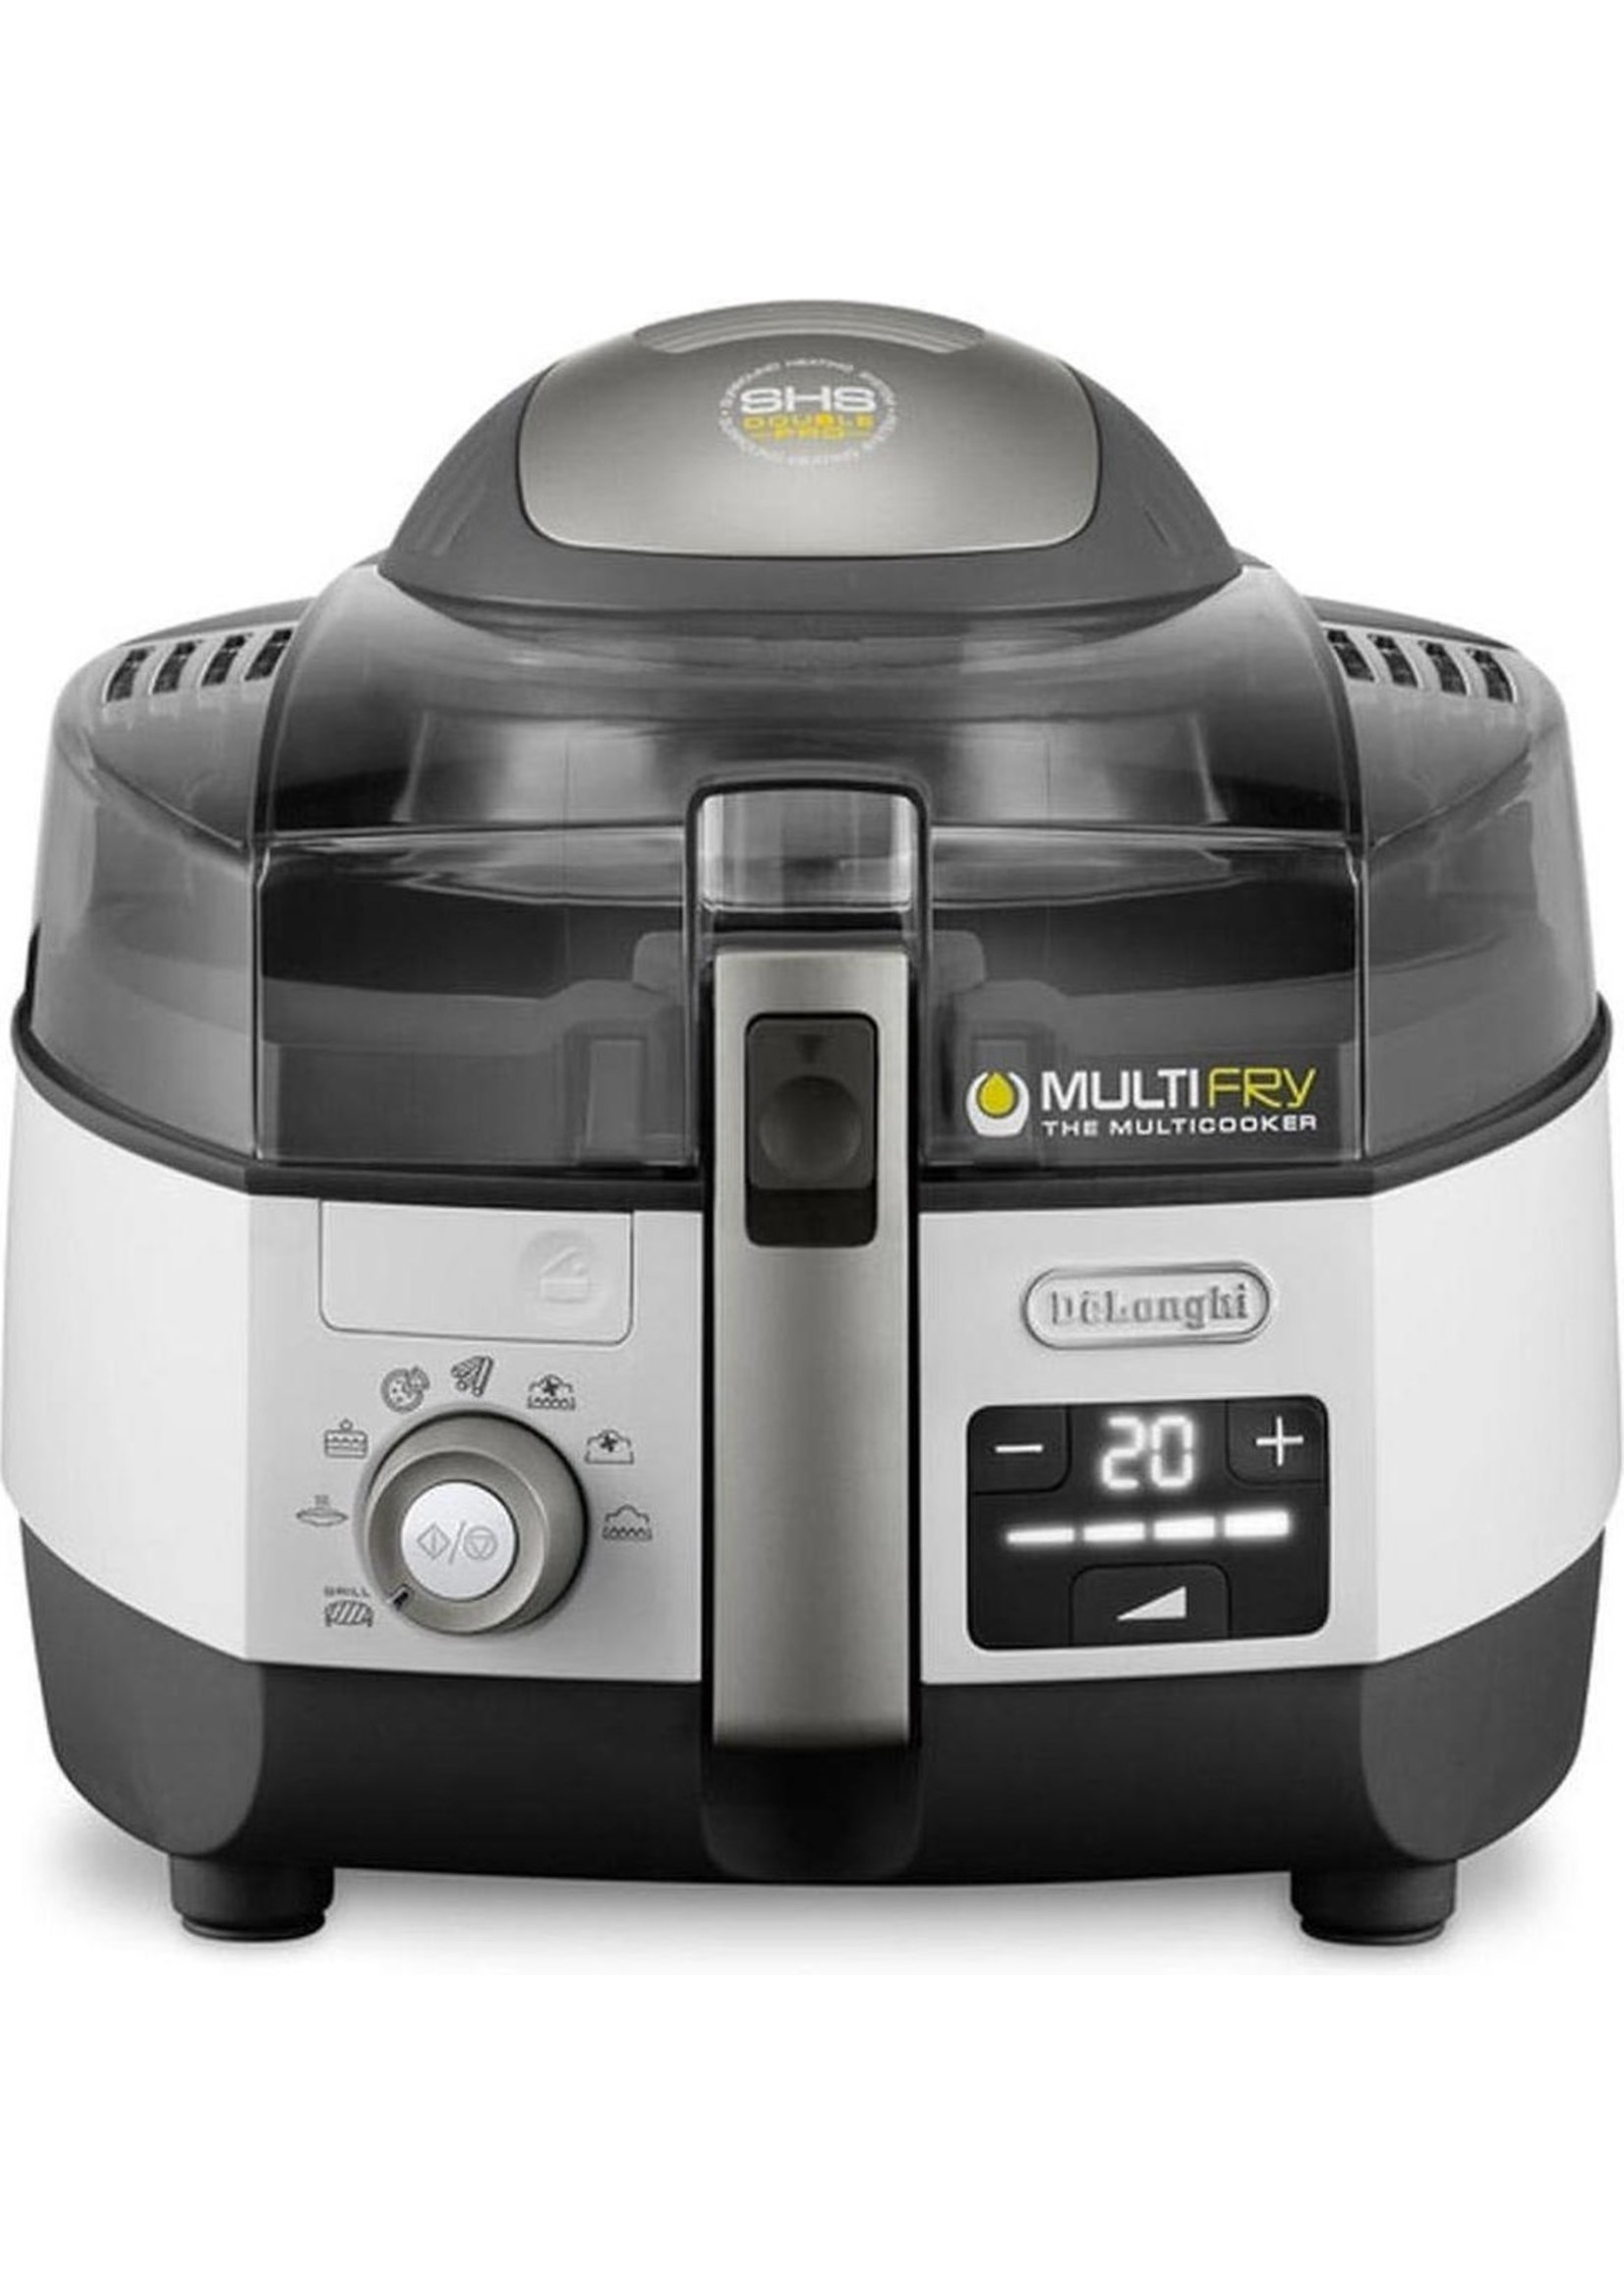 DeLonghi De'Longhi FH1396 Multifryer Extra Chef Plus